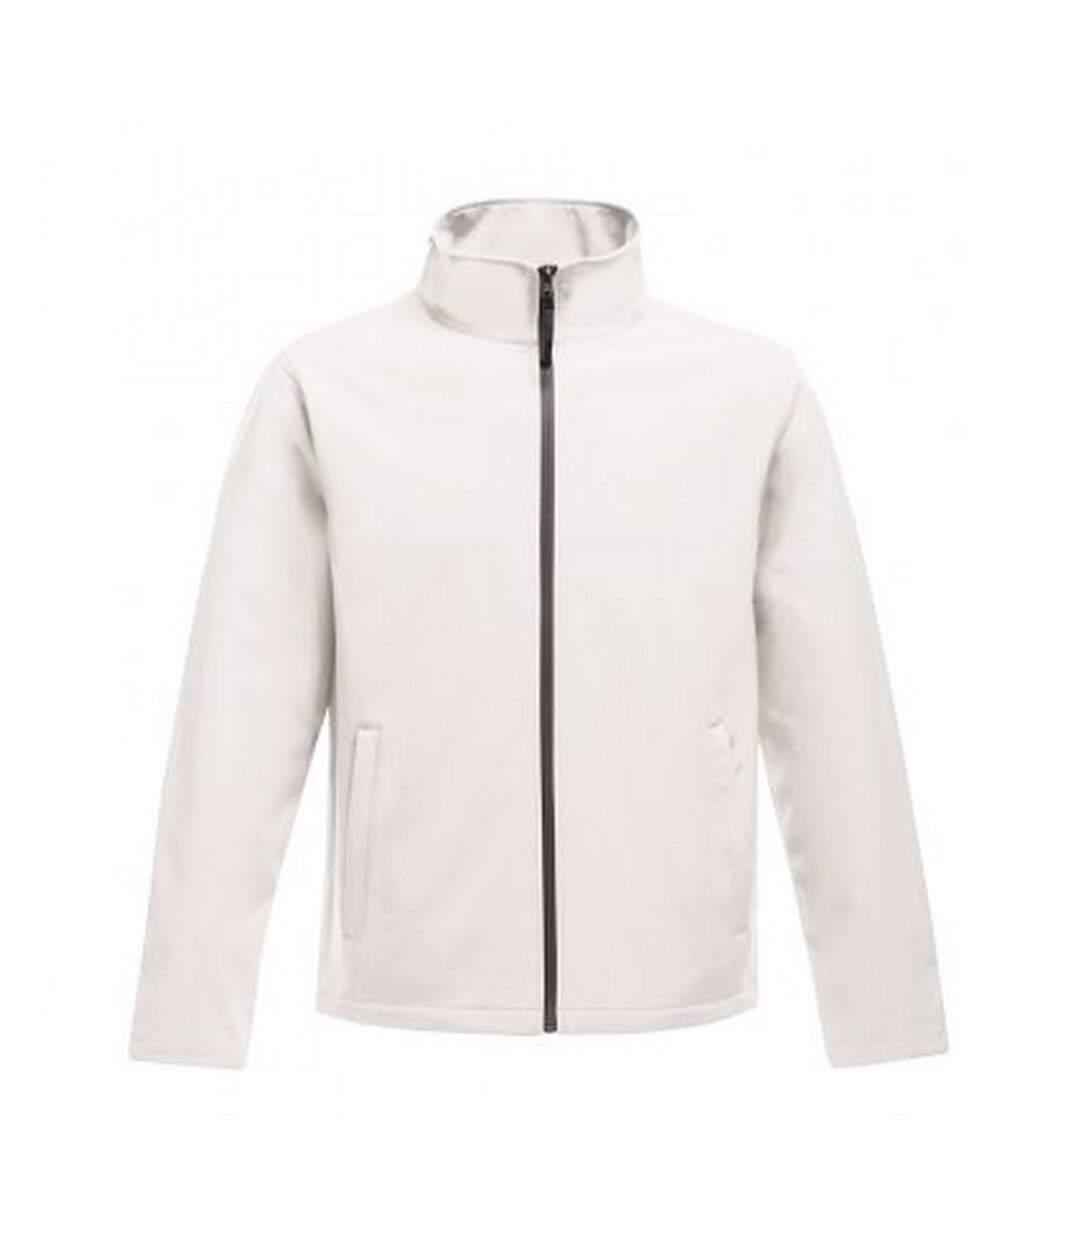 Regatta - Veste En Softshell Standout Ablaze - Homme (Blanc / gris) - UTPC3322